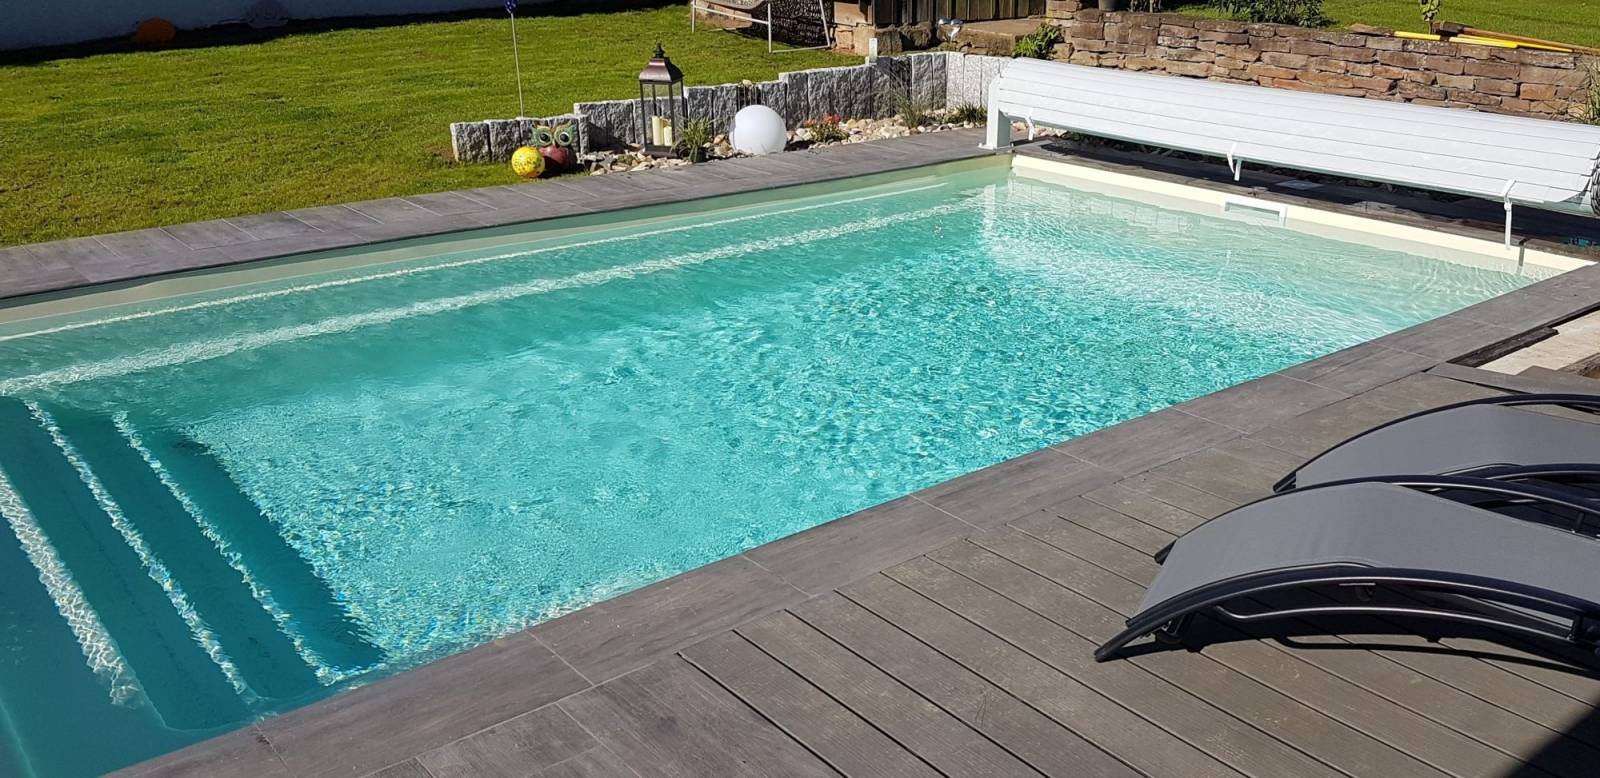 Piscine coque polyester mod le cobalt 8 alliances piscines - Renovation piscine coque polyester ...